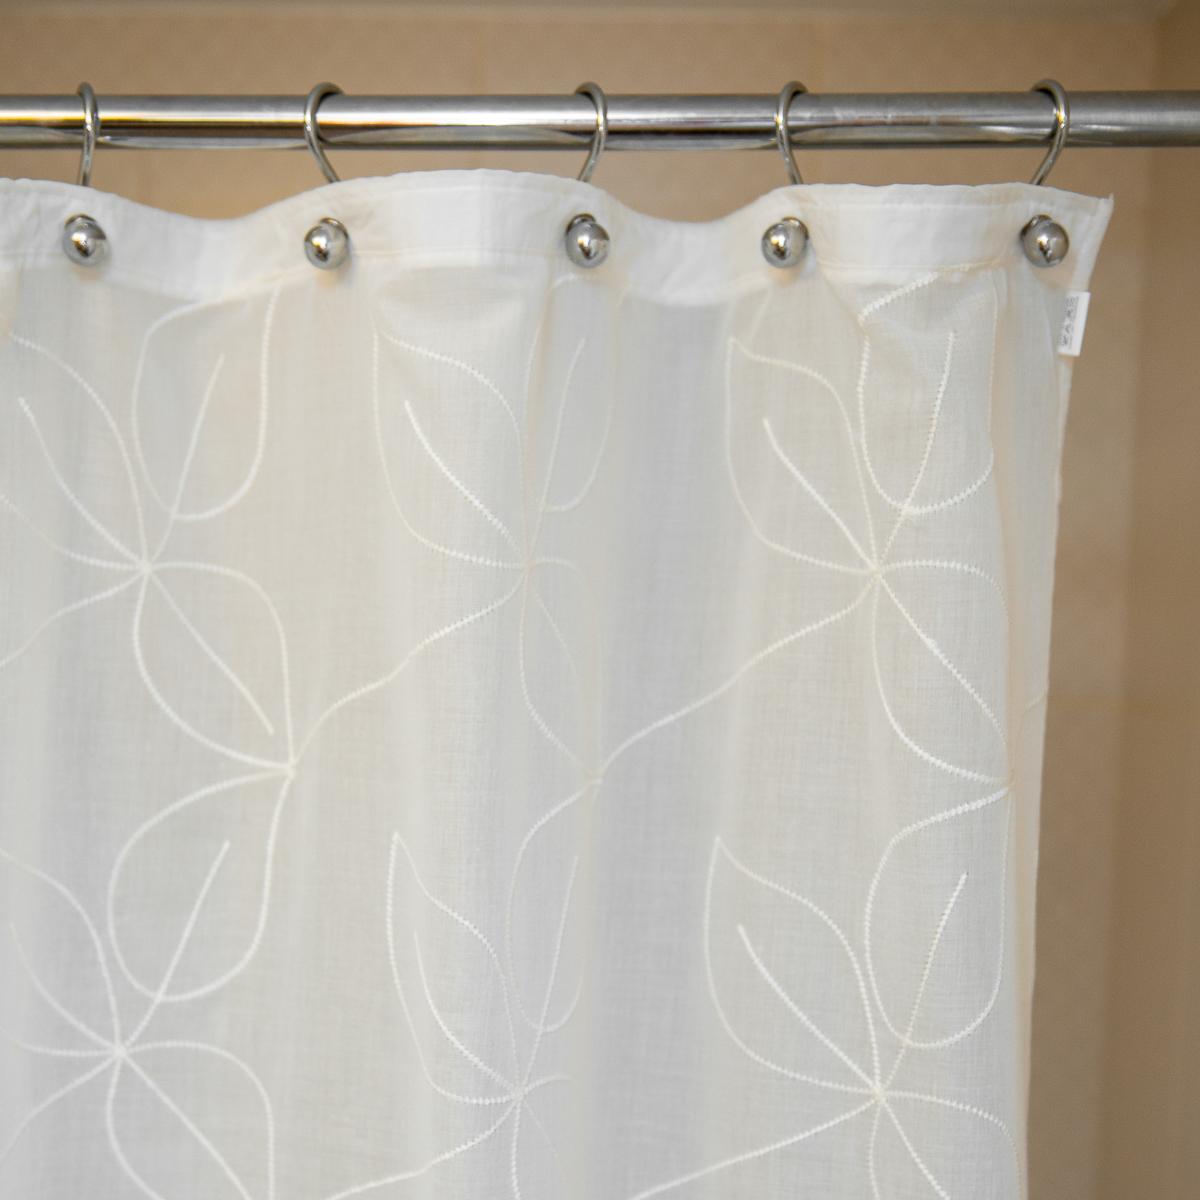 Шторки для ванной Шторка для ванной 180x200 Arti-Deco Embroidery 1805 Hojas elitnaya-shtorka-dlya-vannoy-embroidery-1805-hojas-ot-arti-deco-ispaniya.jpg